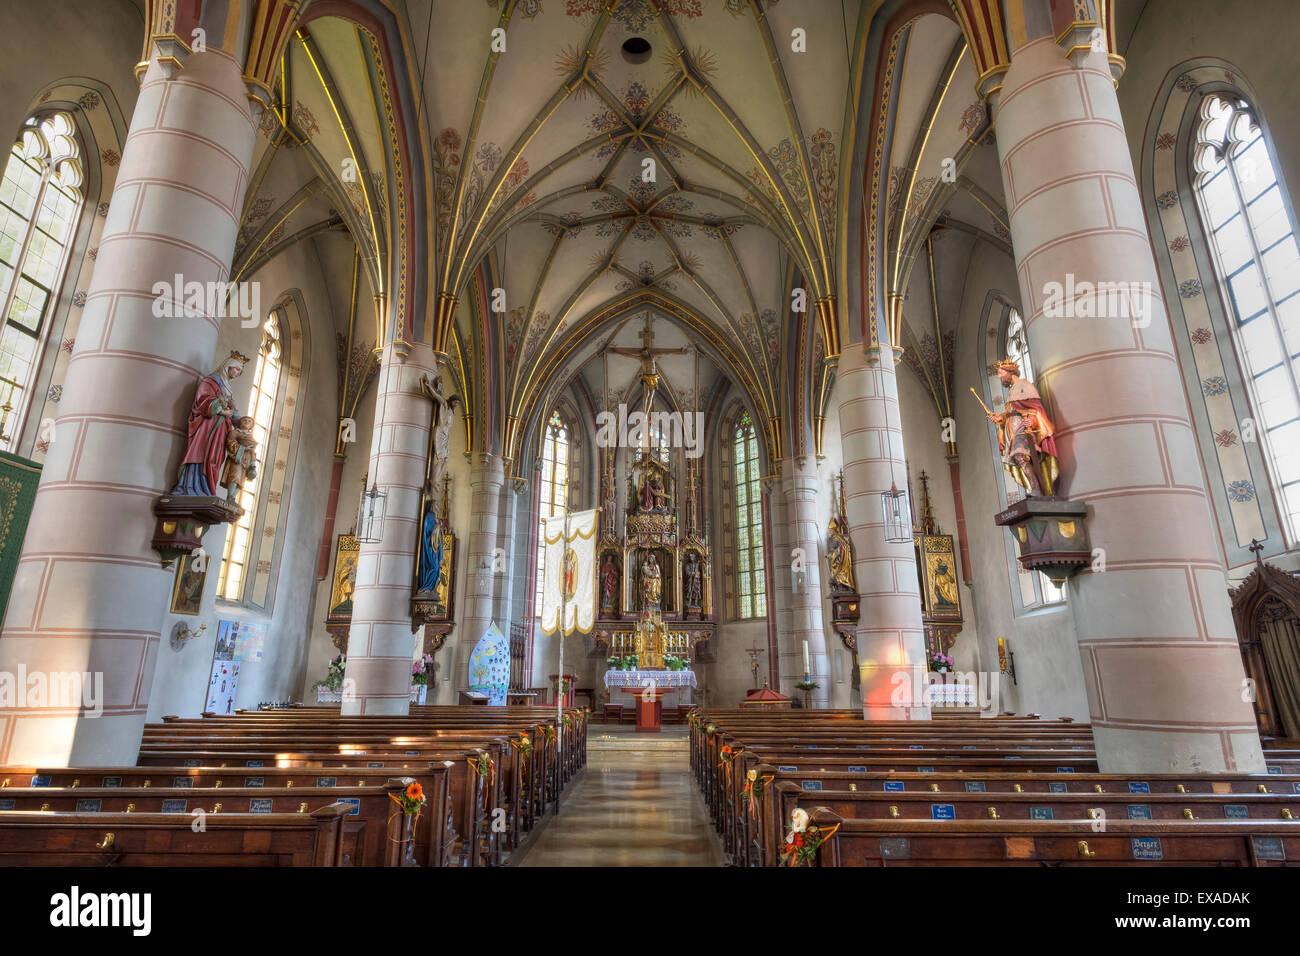 Parish Church of St. Lawrence, Obing, Chiemgau, Upper Bavaria, Bavaria, Germany - Stock Image